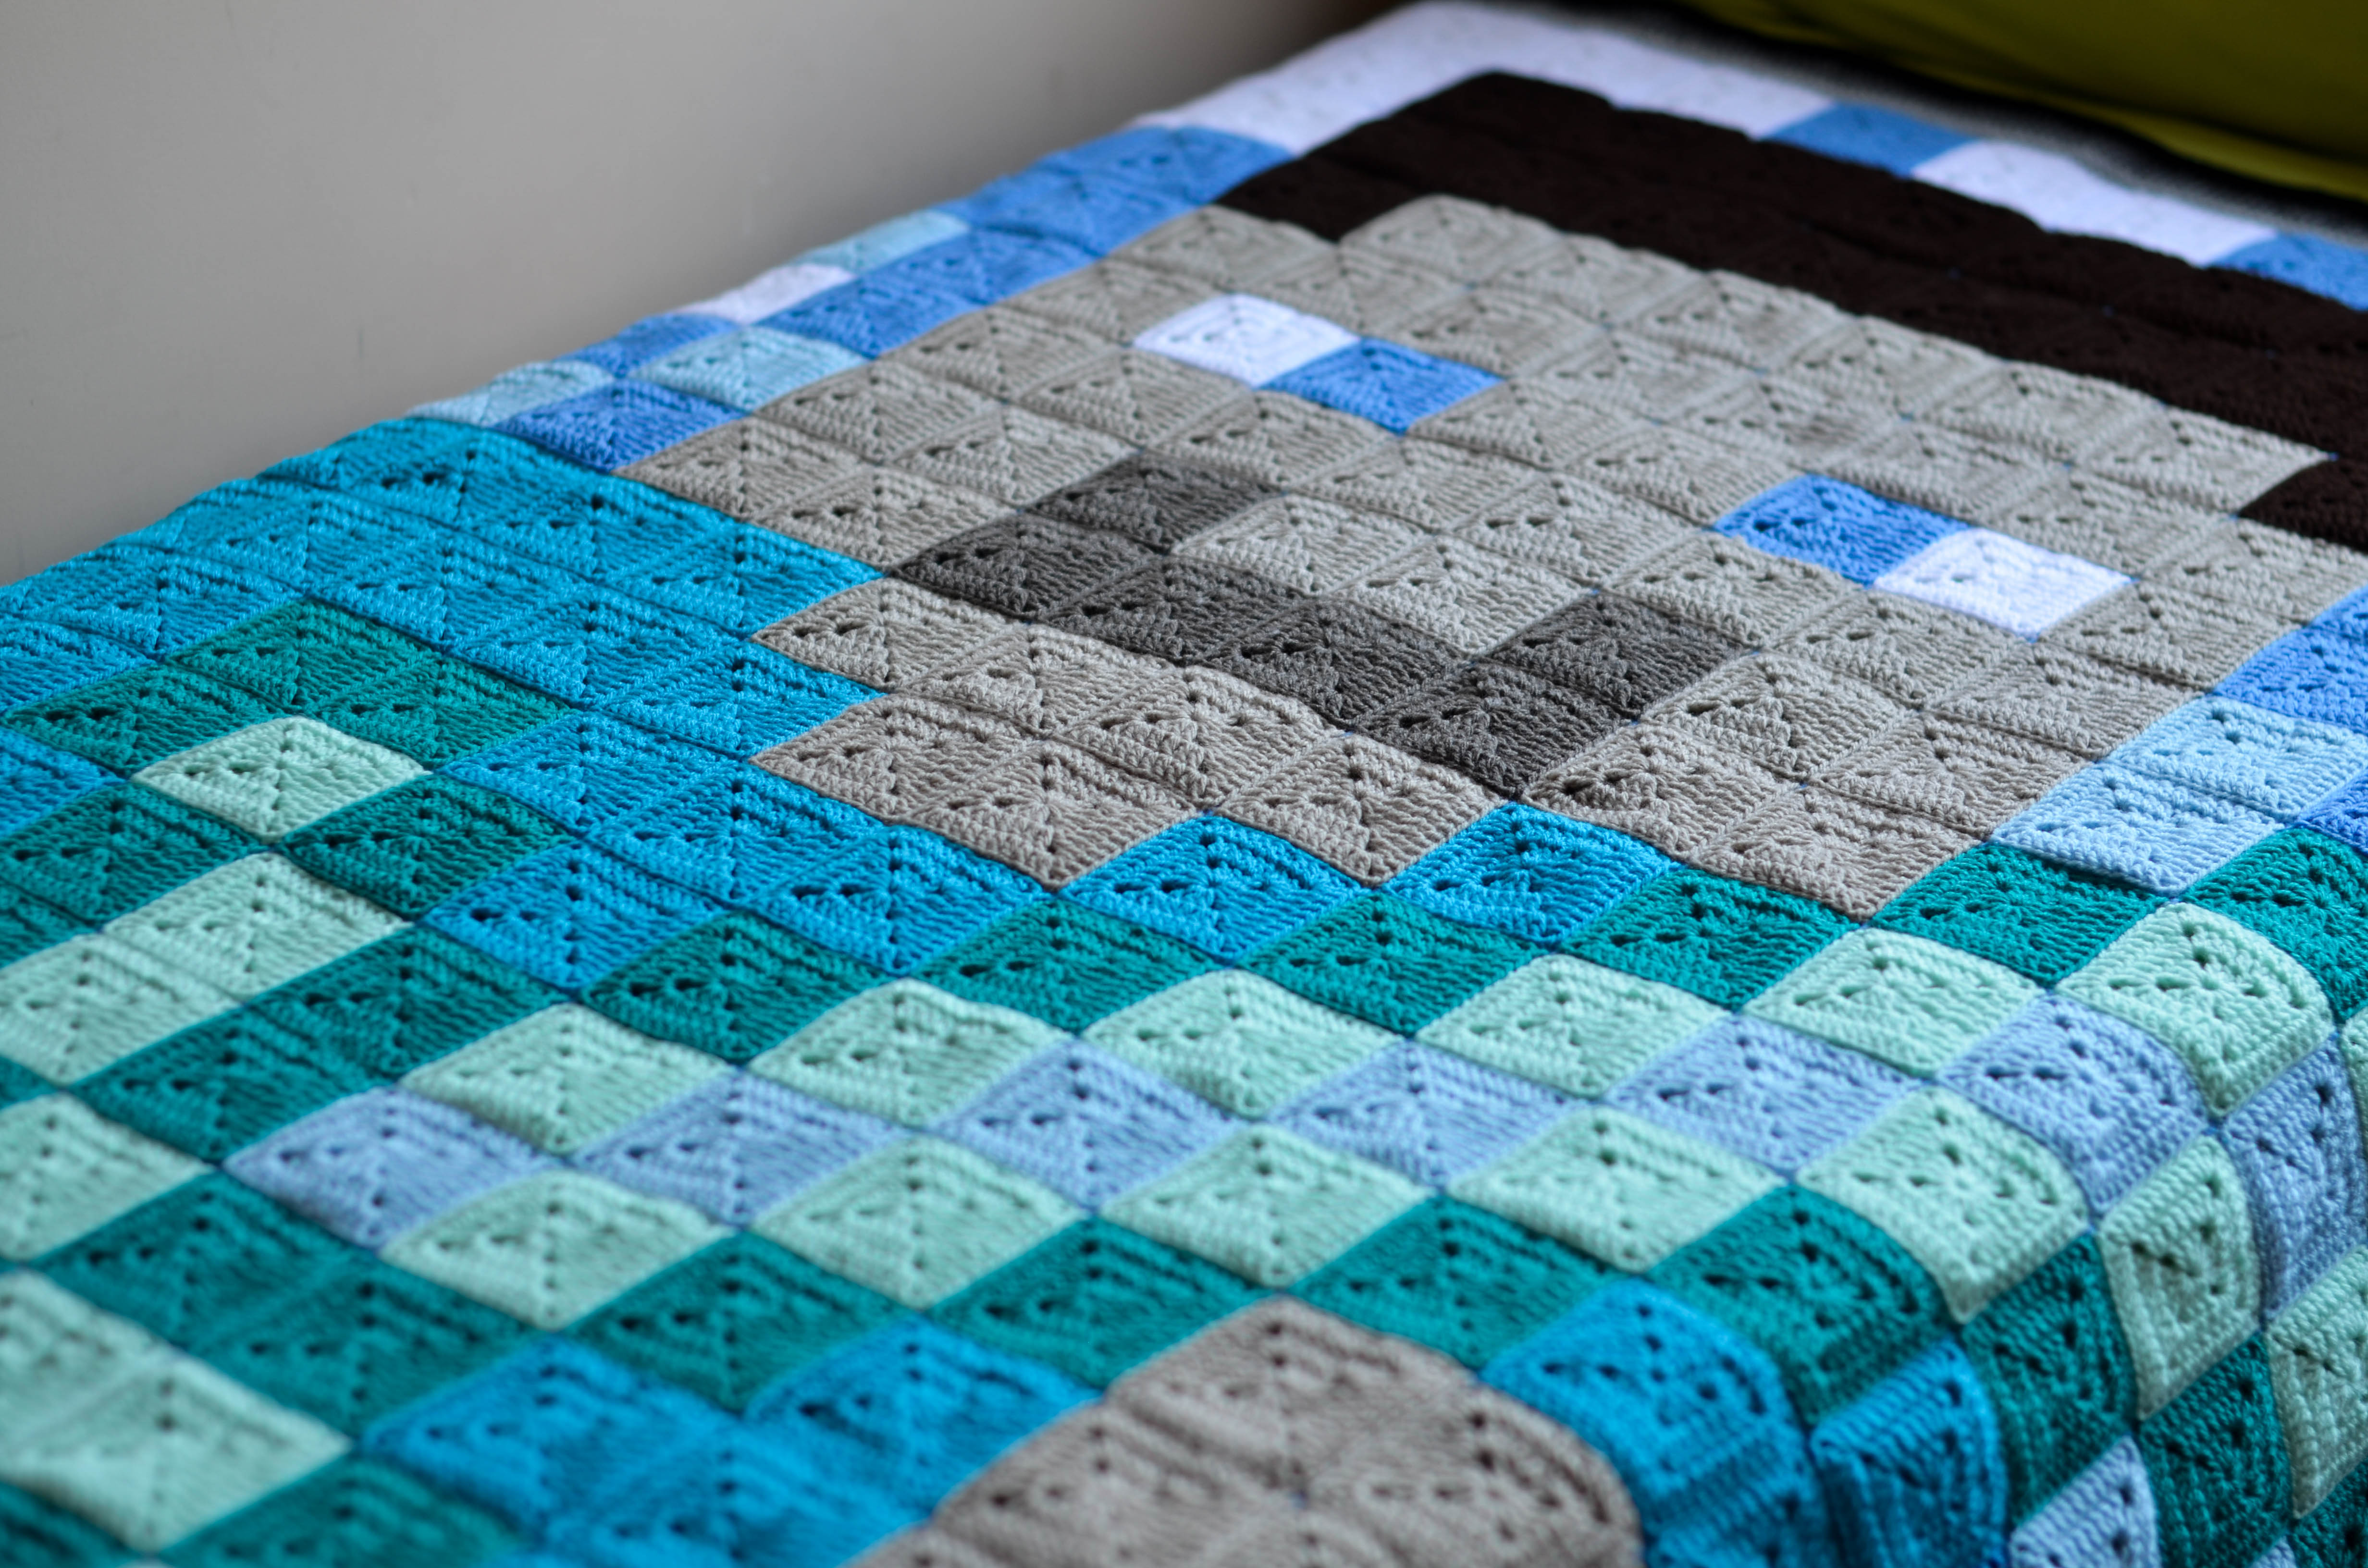 Crochet Minecraft Blanket – The LOOPY STITCH